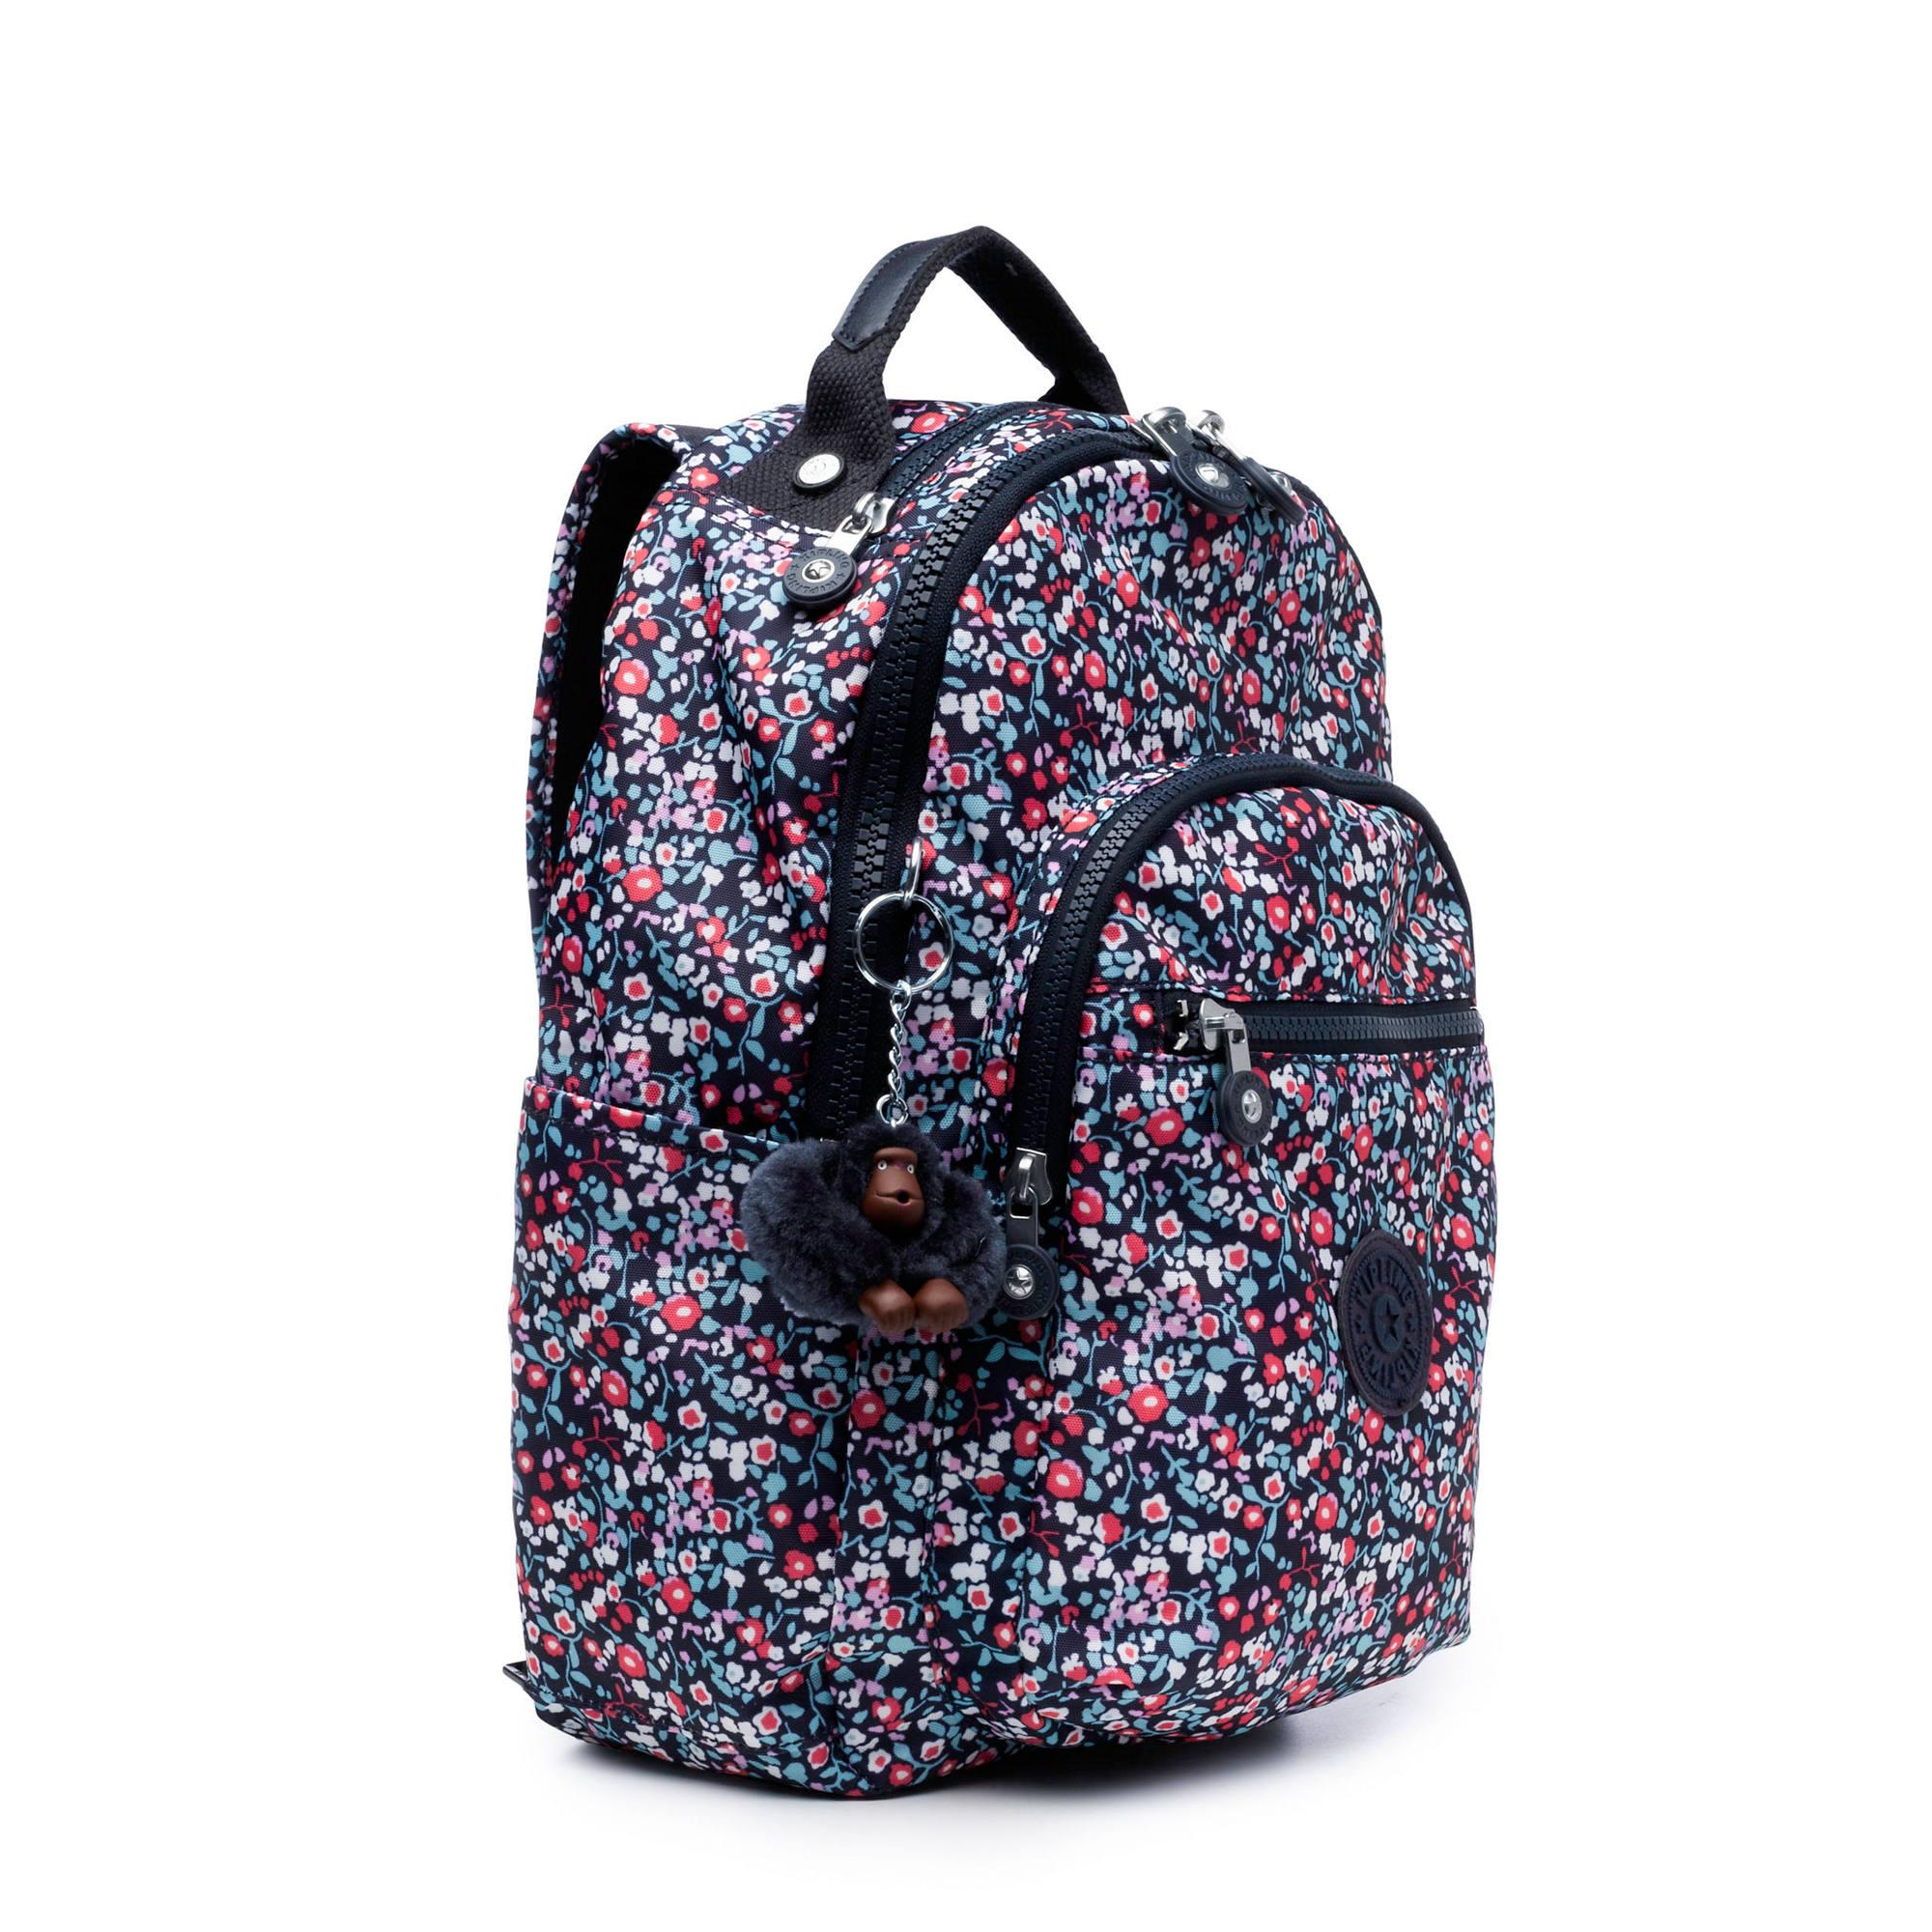 Kipling-Seoul-Small-11-034-Laptop-Backpack thumbnail 32